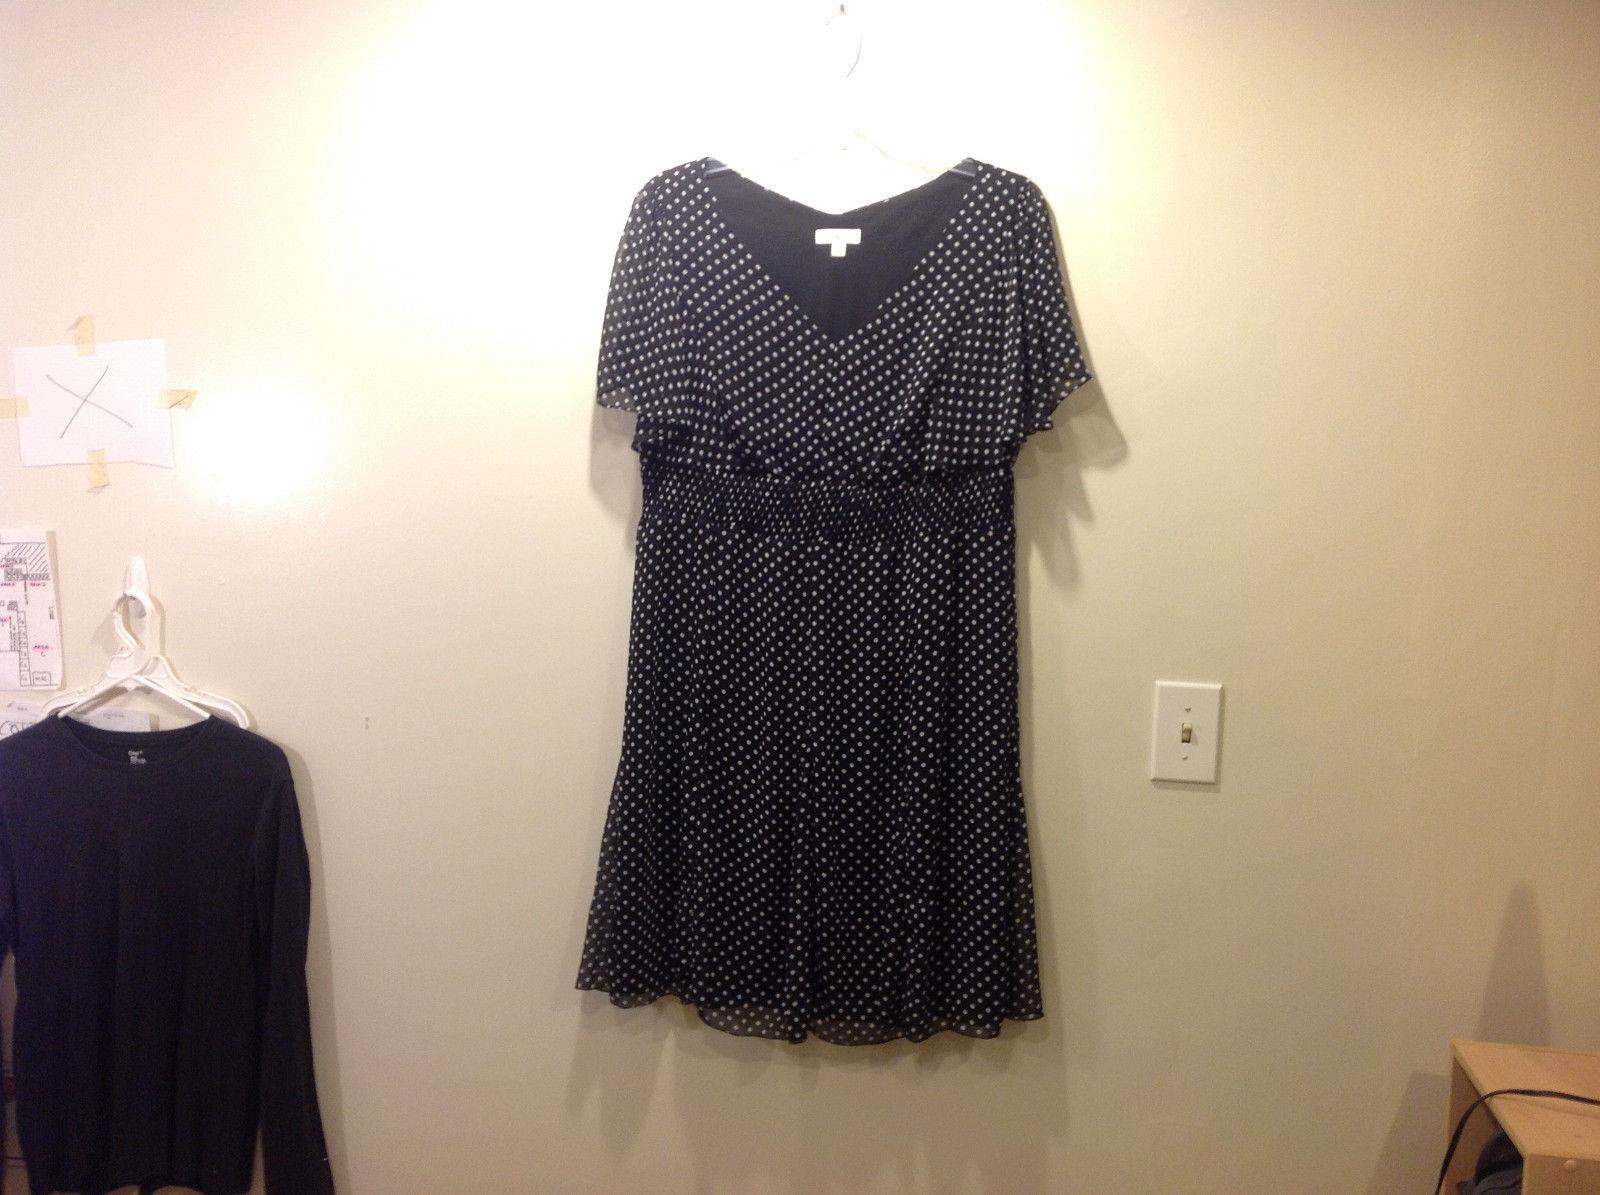 Dressbarn black dress with white polka dots